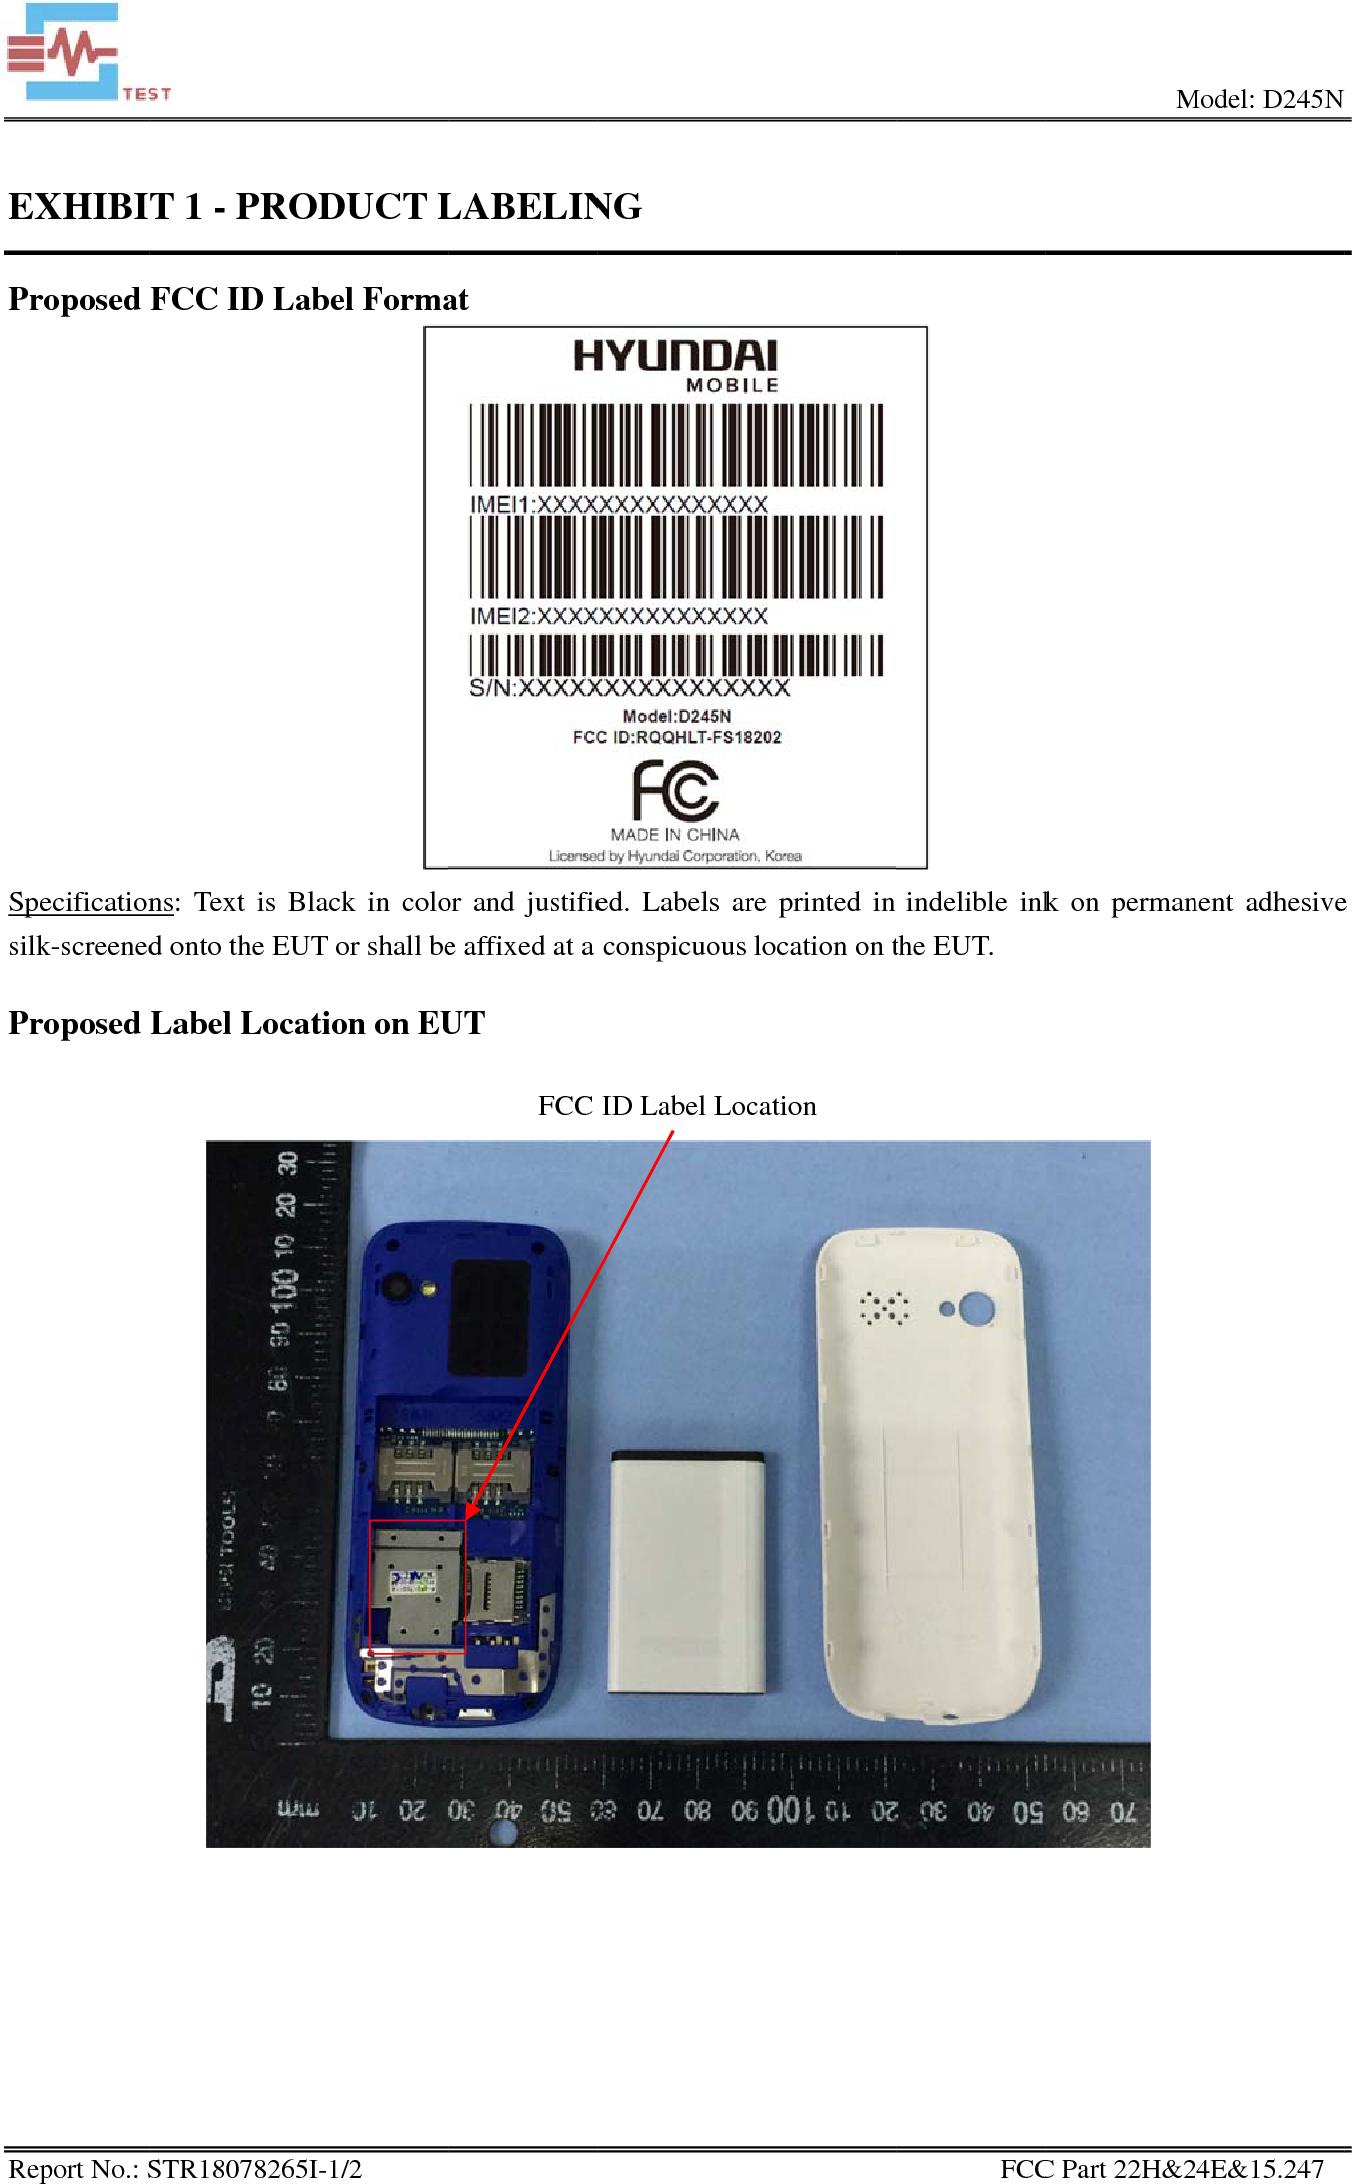 Hyundai Corporation Mobile Phone Hlt Fs18202 Rqqhlt Fs18202 Fcc Application For Mobile Phone Approved For Hyundai Corporation Of S Mobile Phone Mobile Phone